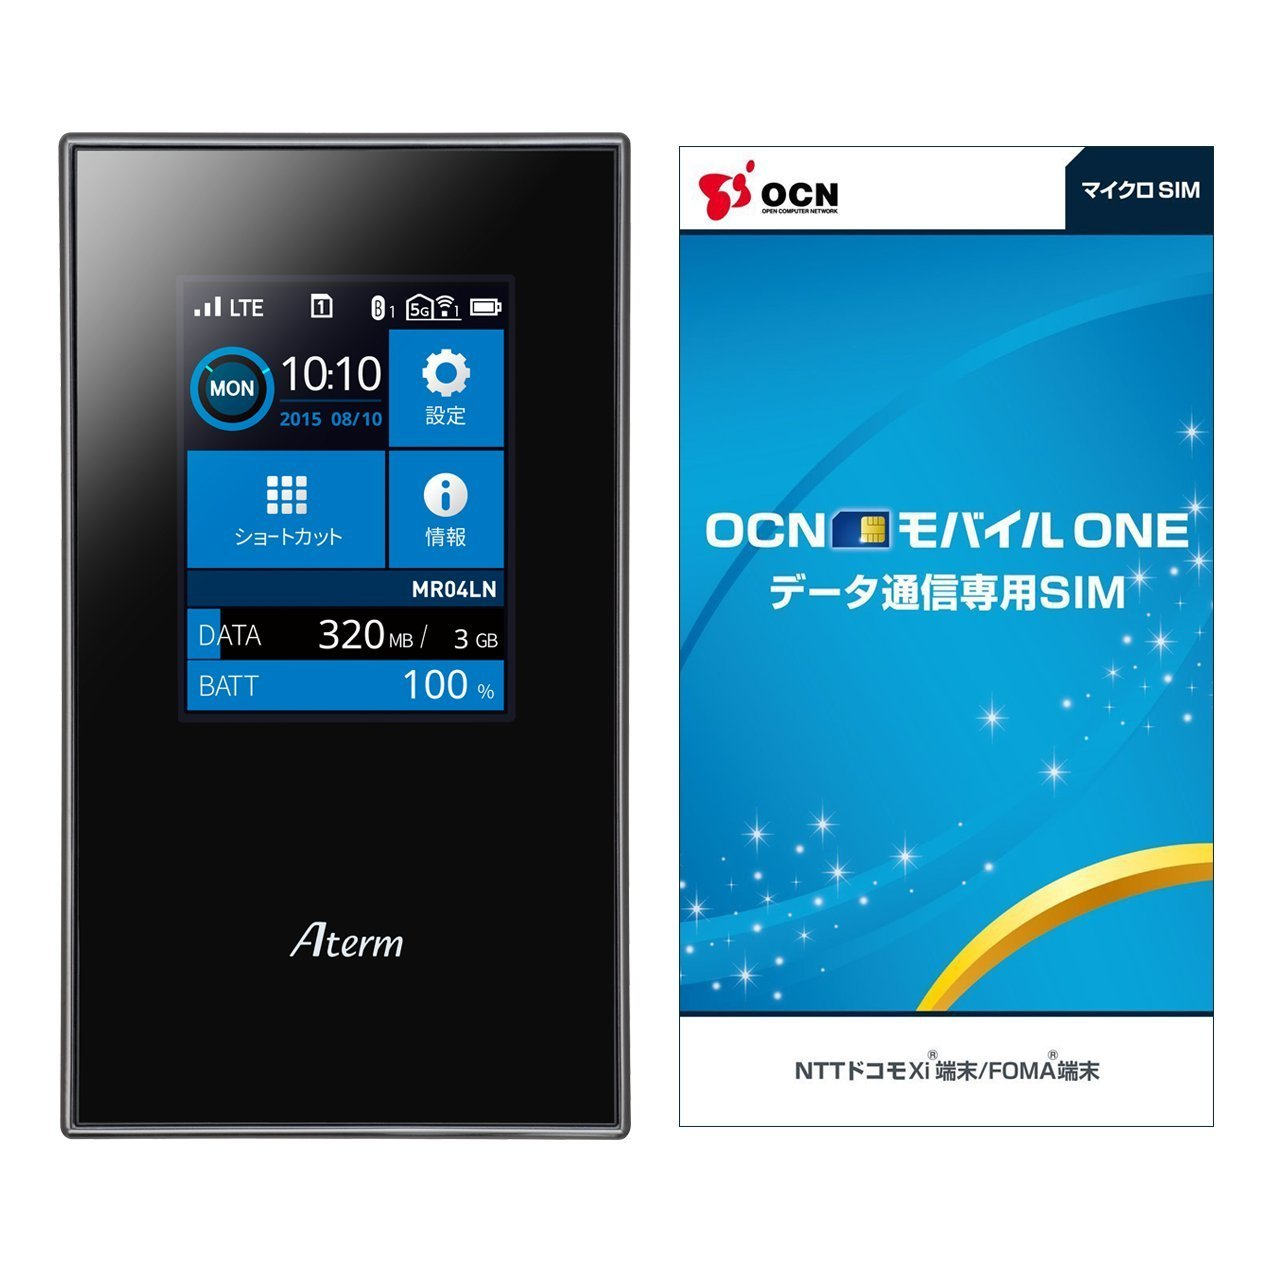 NEC Aterm MR04LN 3B LTE対応 モバイルルーター